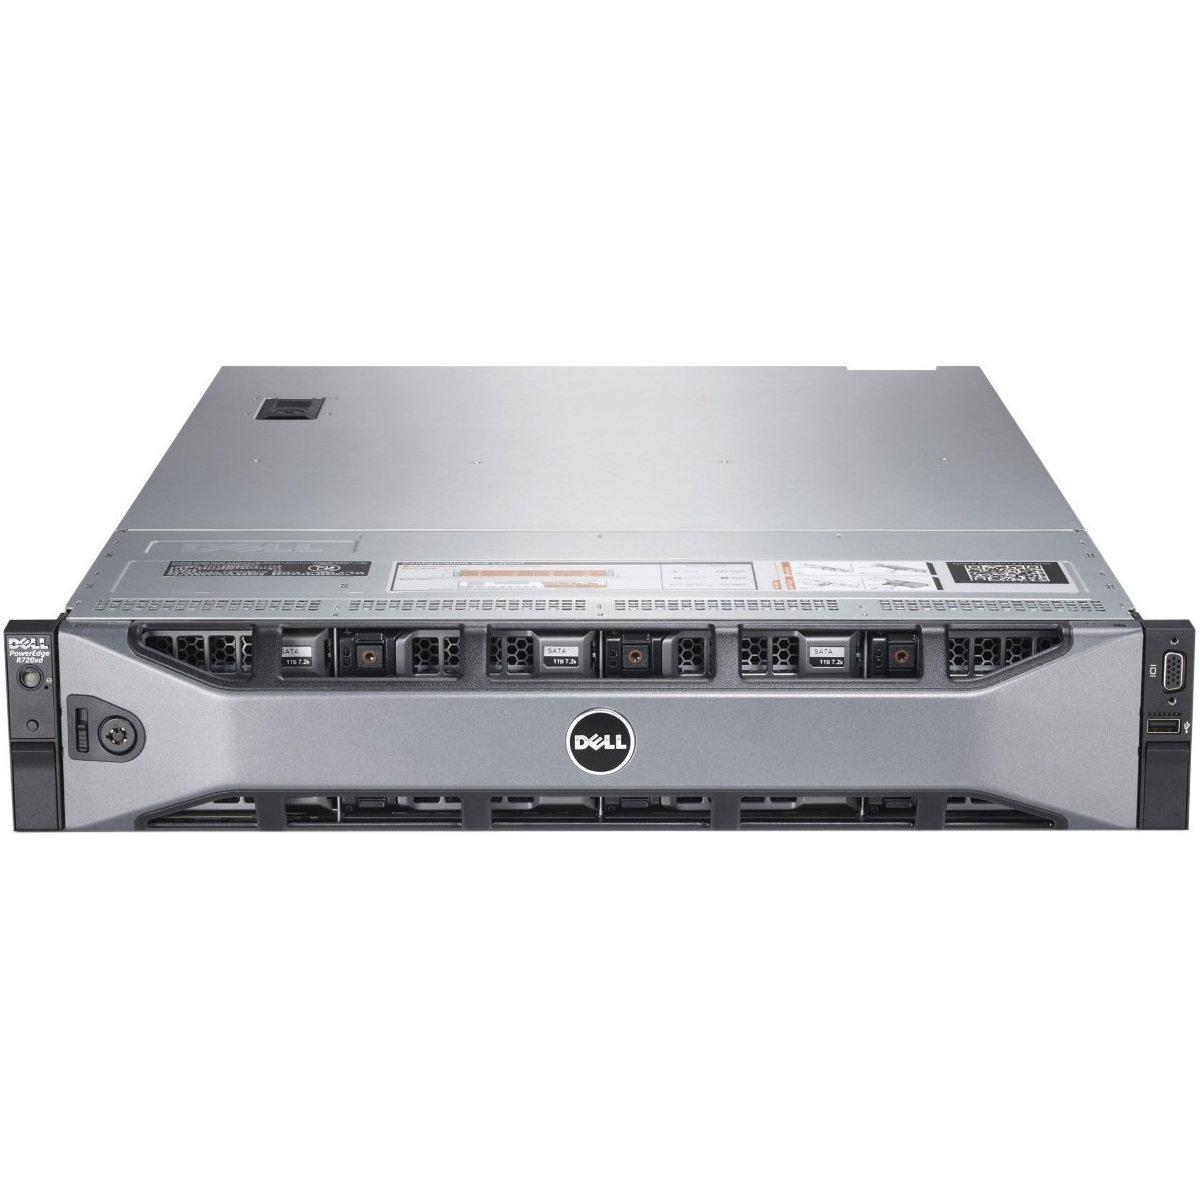 Dell PowerEdge R720 2U Rack Server - 2 x Intel Xeon E5-2670 2.60 GHz - 2 Processor Support - 128 GB Standard/1.50 TB Maximum RAM - 600 GB HDD - Gigabit Ethernet - 462-5608